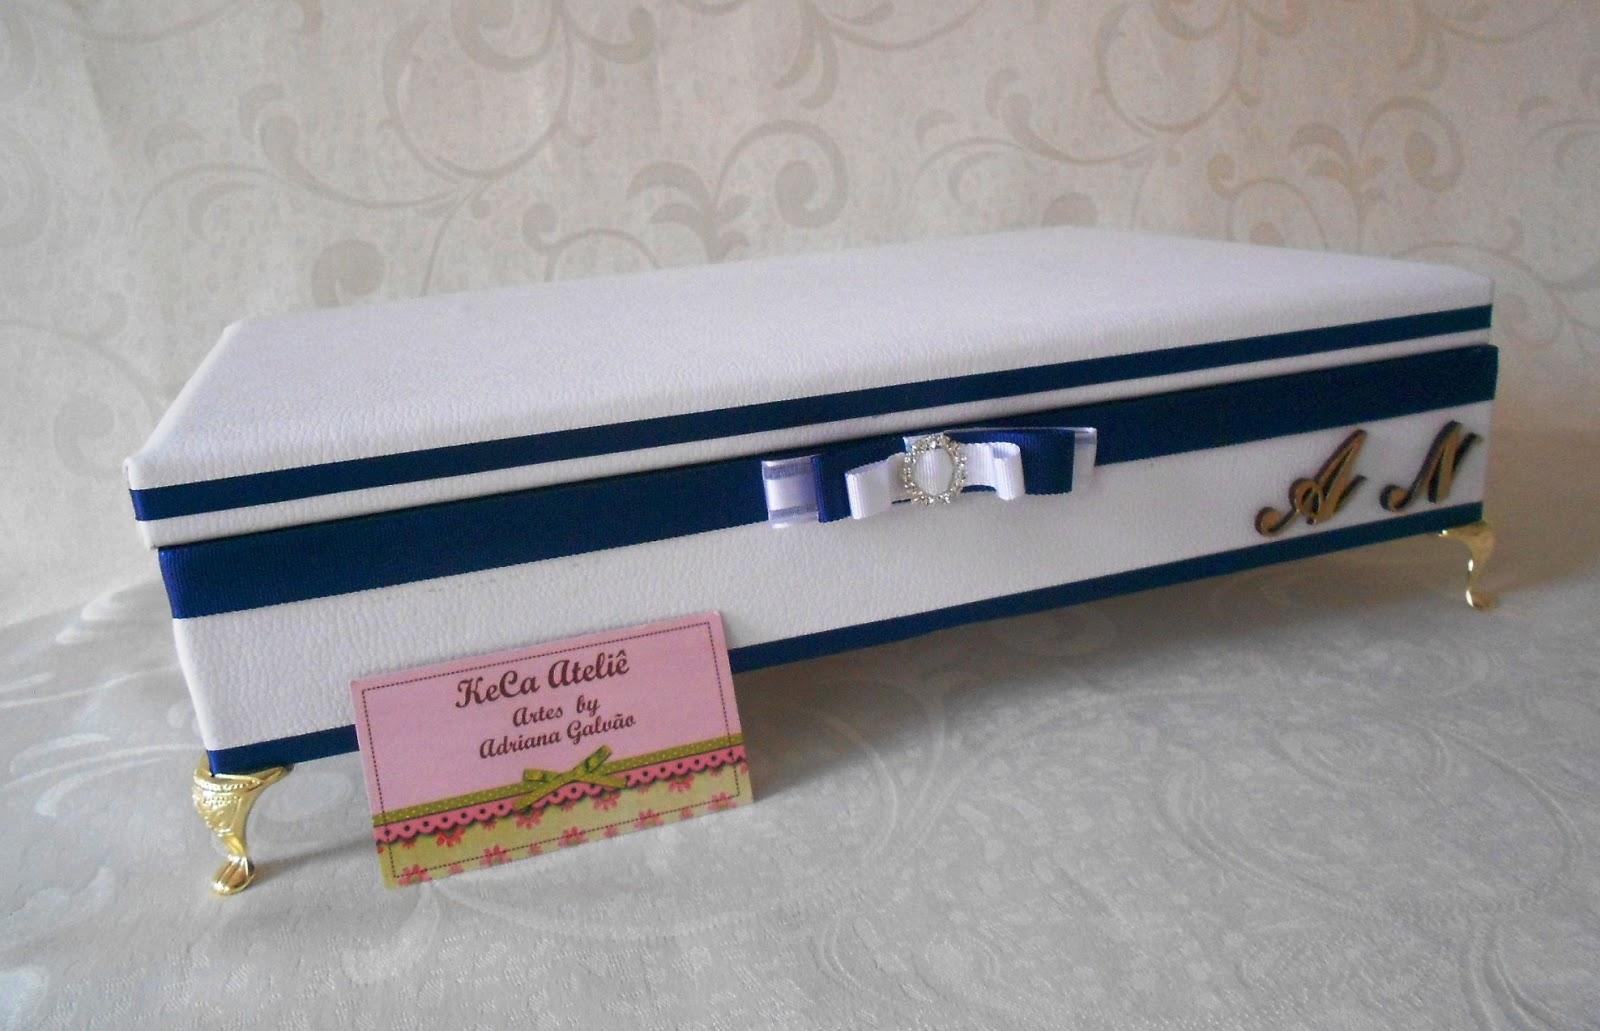 Kit toalete casamento branco : Keca ateli? kit toalete casamento azul e branco